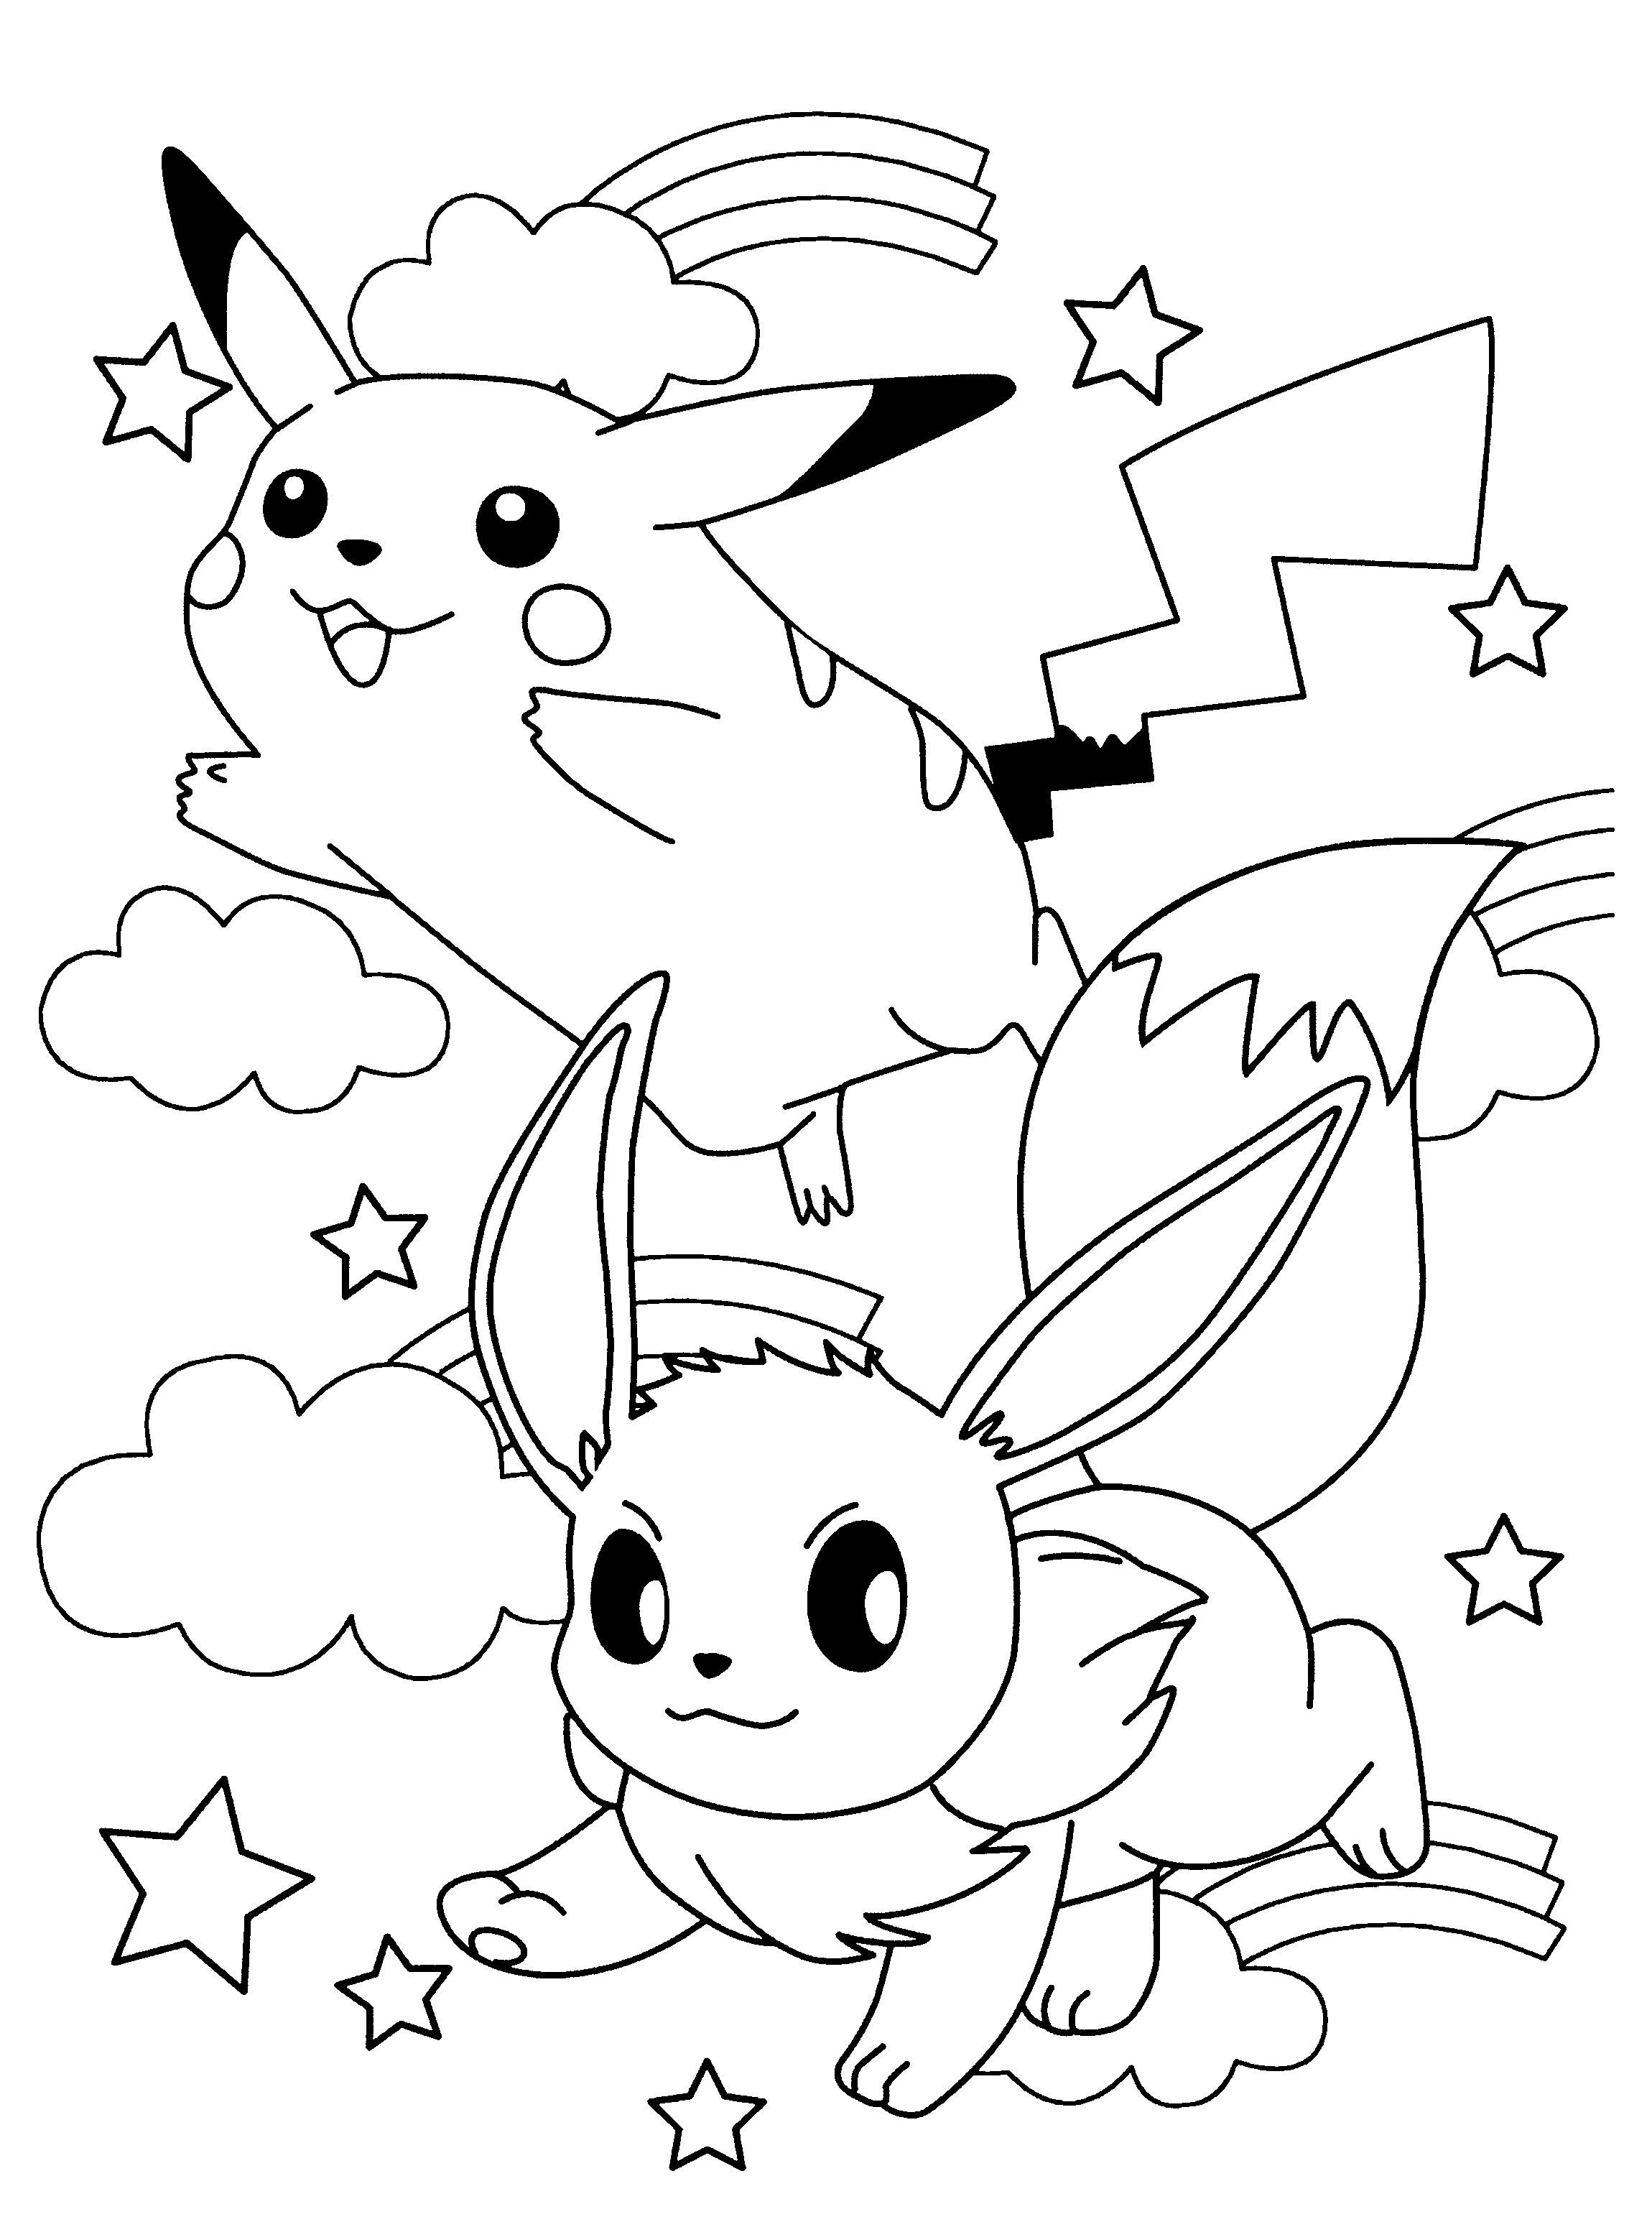 Pokemon Bilder Zum Ausdrucken In Farbe Neu Ausmalbilder Pokemon Ausmalbilder 123 Schön Ausmalbilder Pokemon Fotografieren